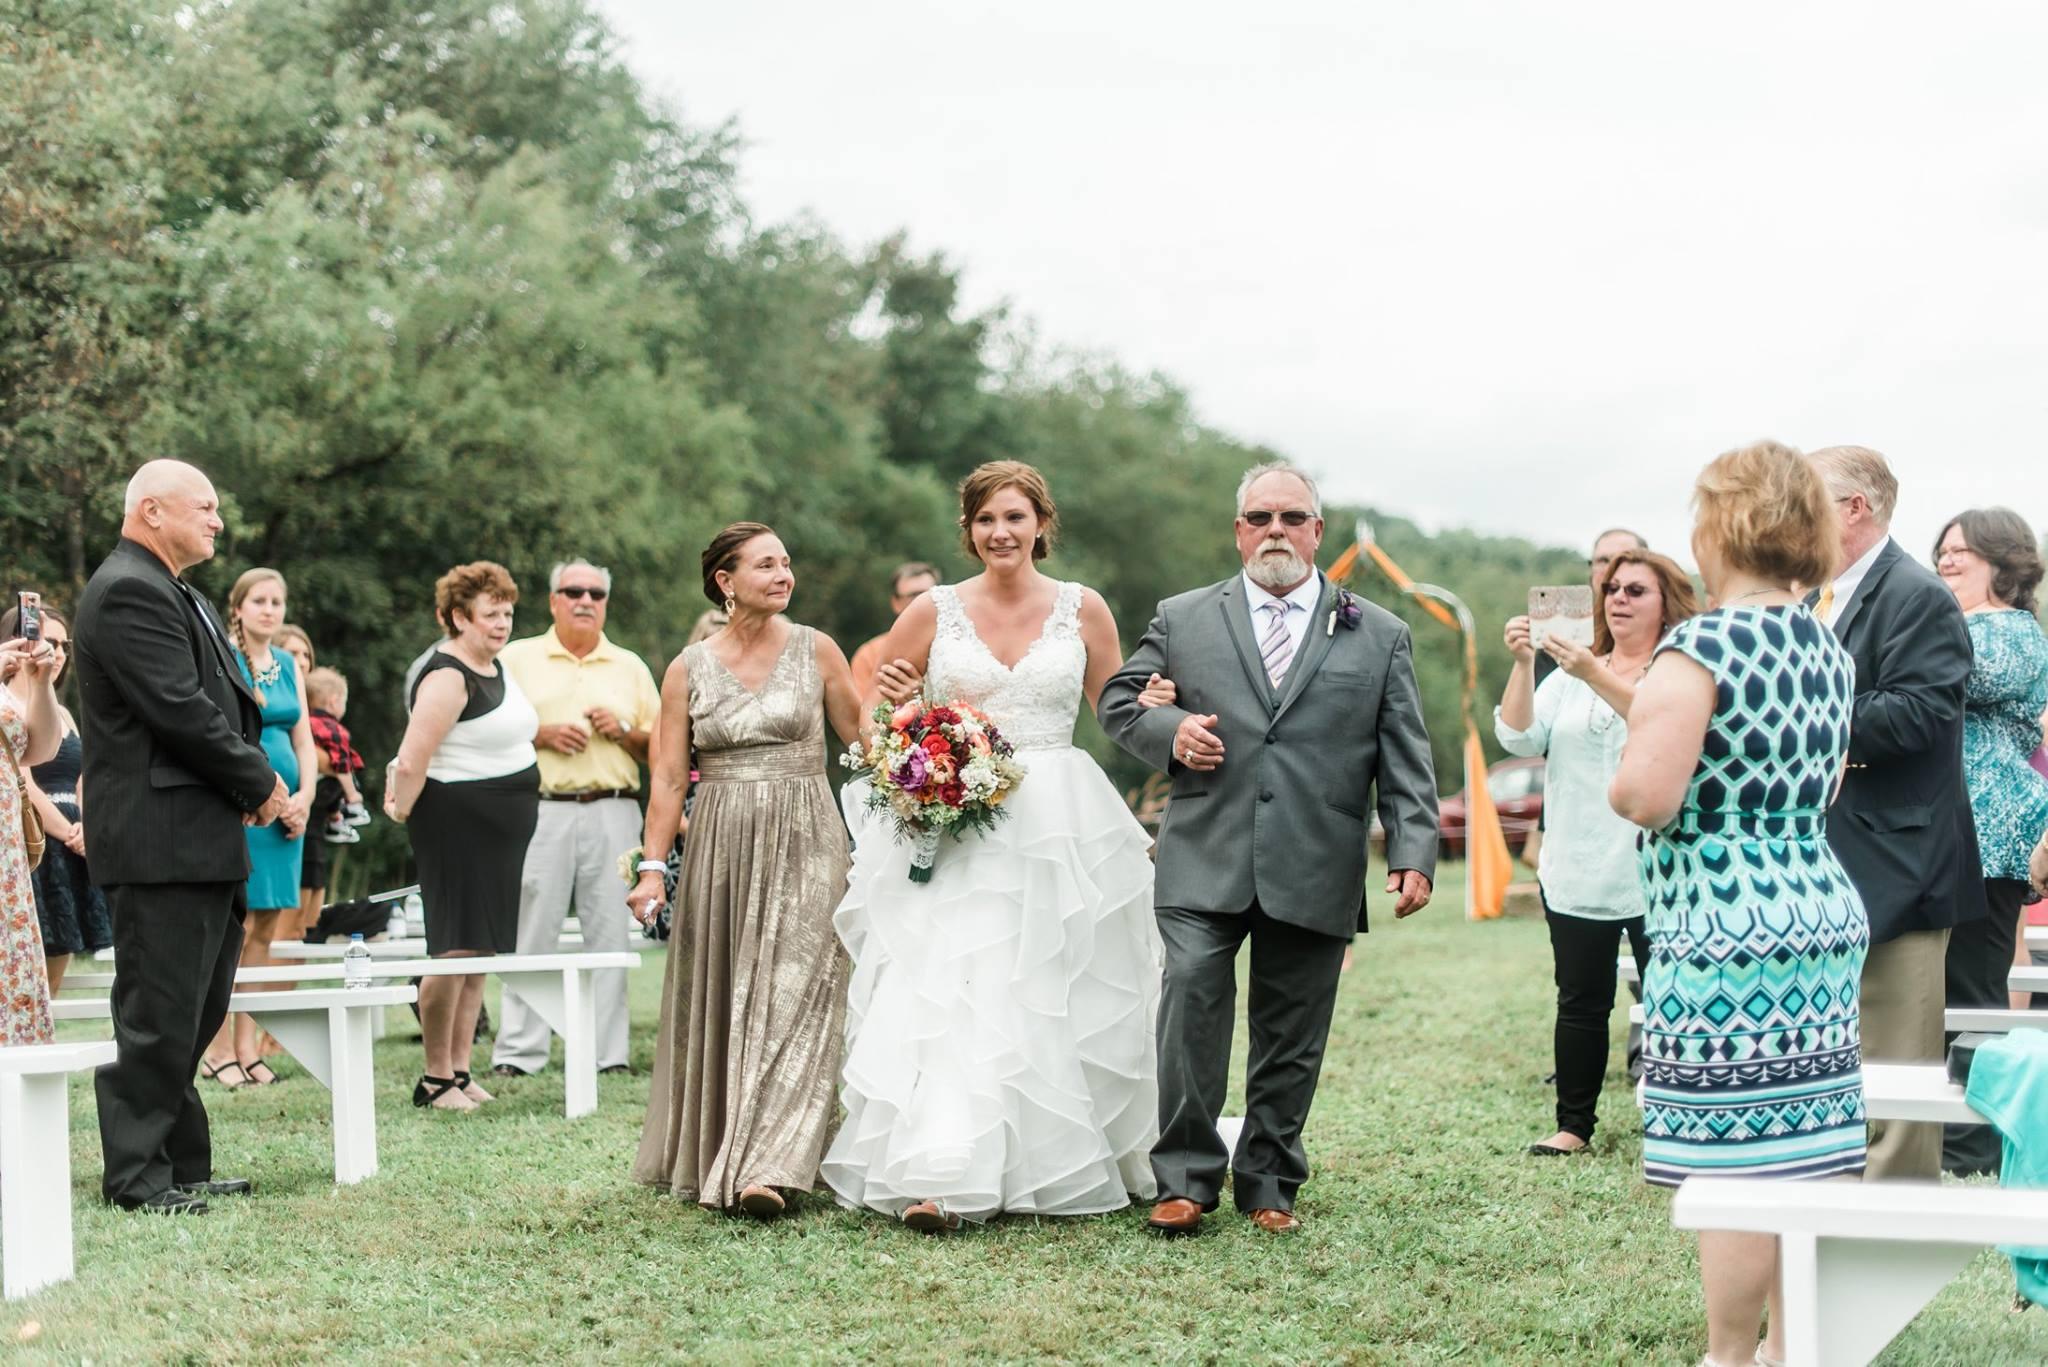 pennsylvania-backyard-wedding-love-diy-bohemian-romantic-colorful-0024.jpg